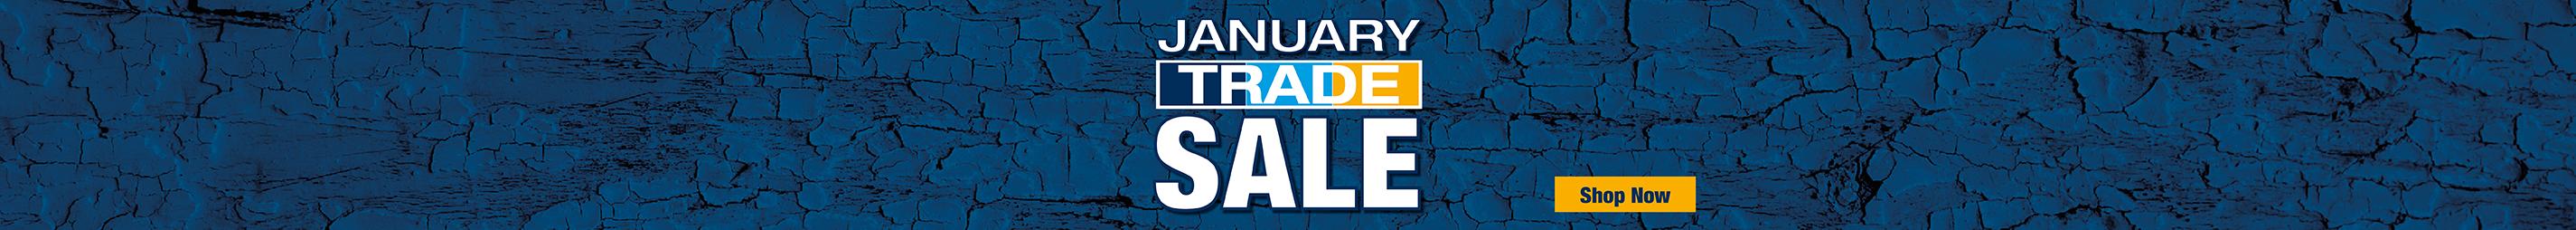 January Trade Sale